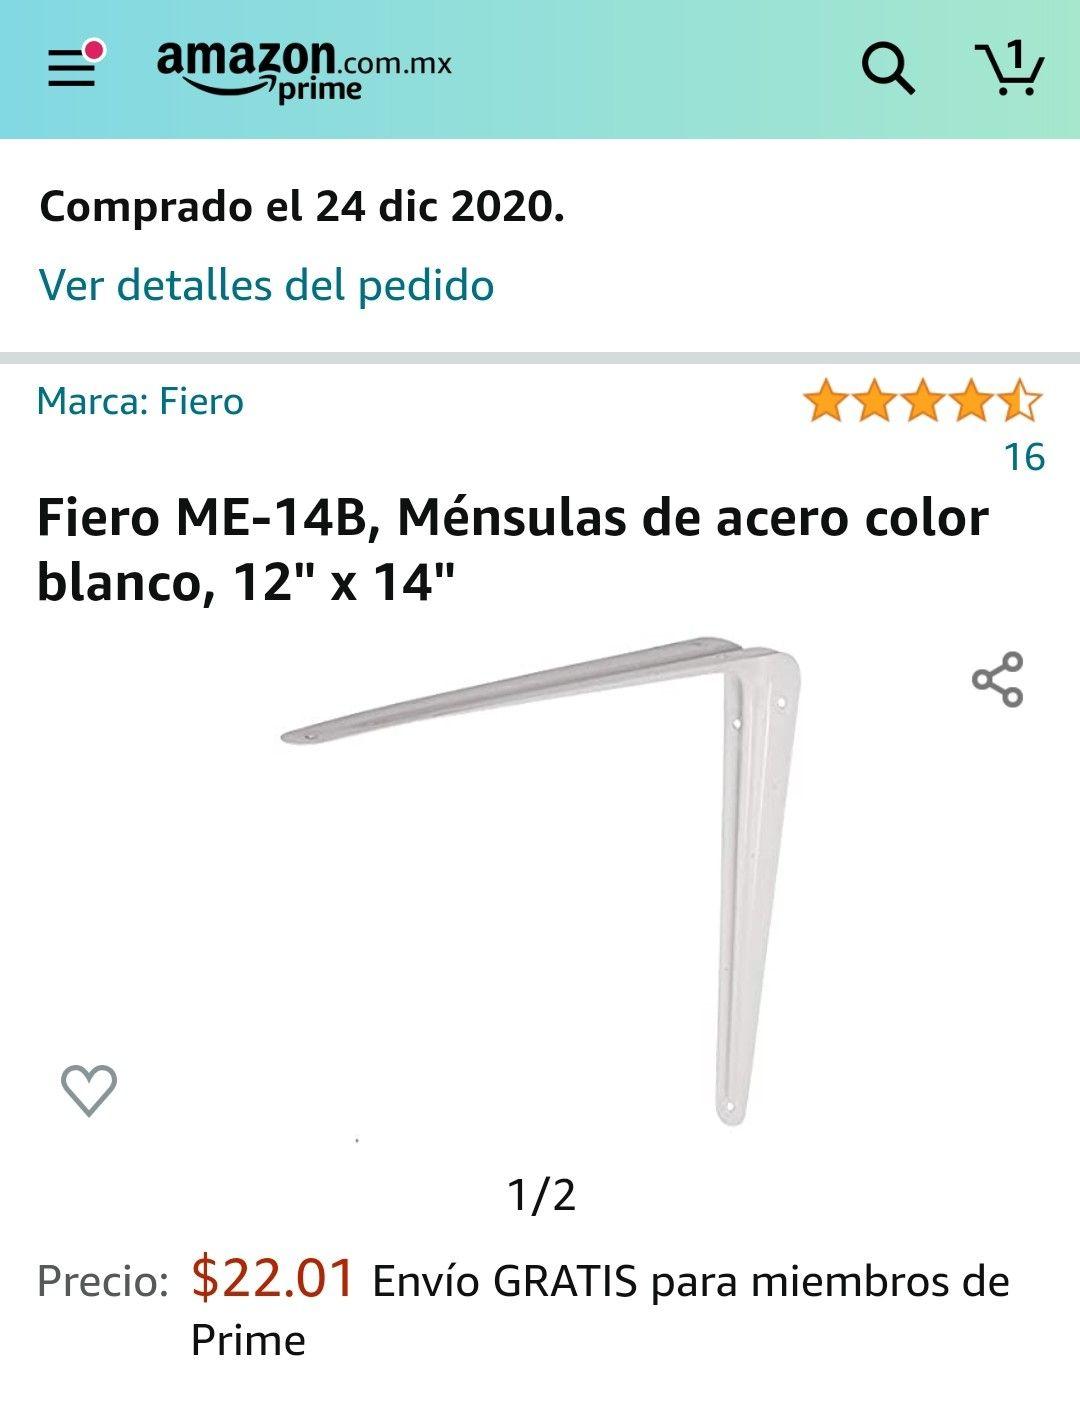 "Amazon: Fiero ME-14B, Ménsulas de acero color blanco, 12"" x 14"""